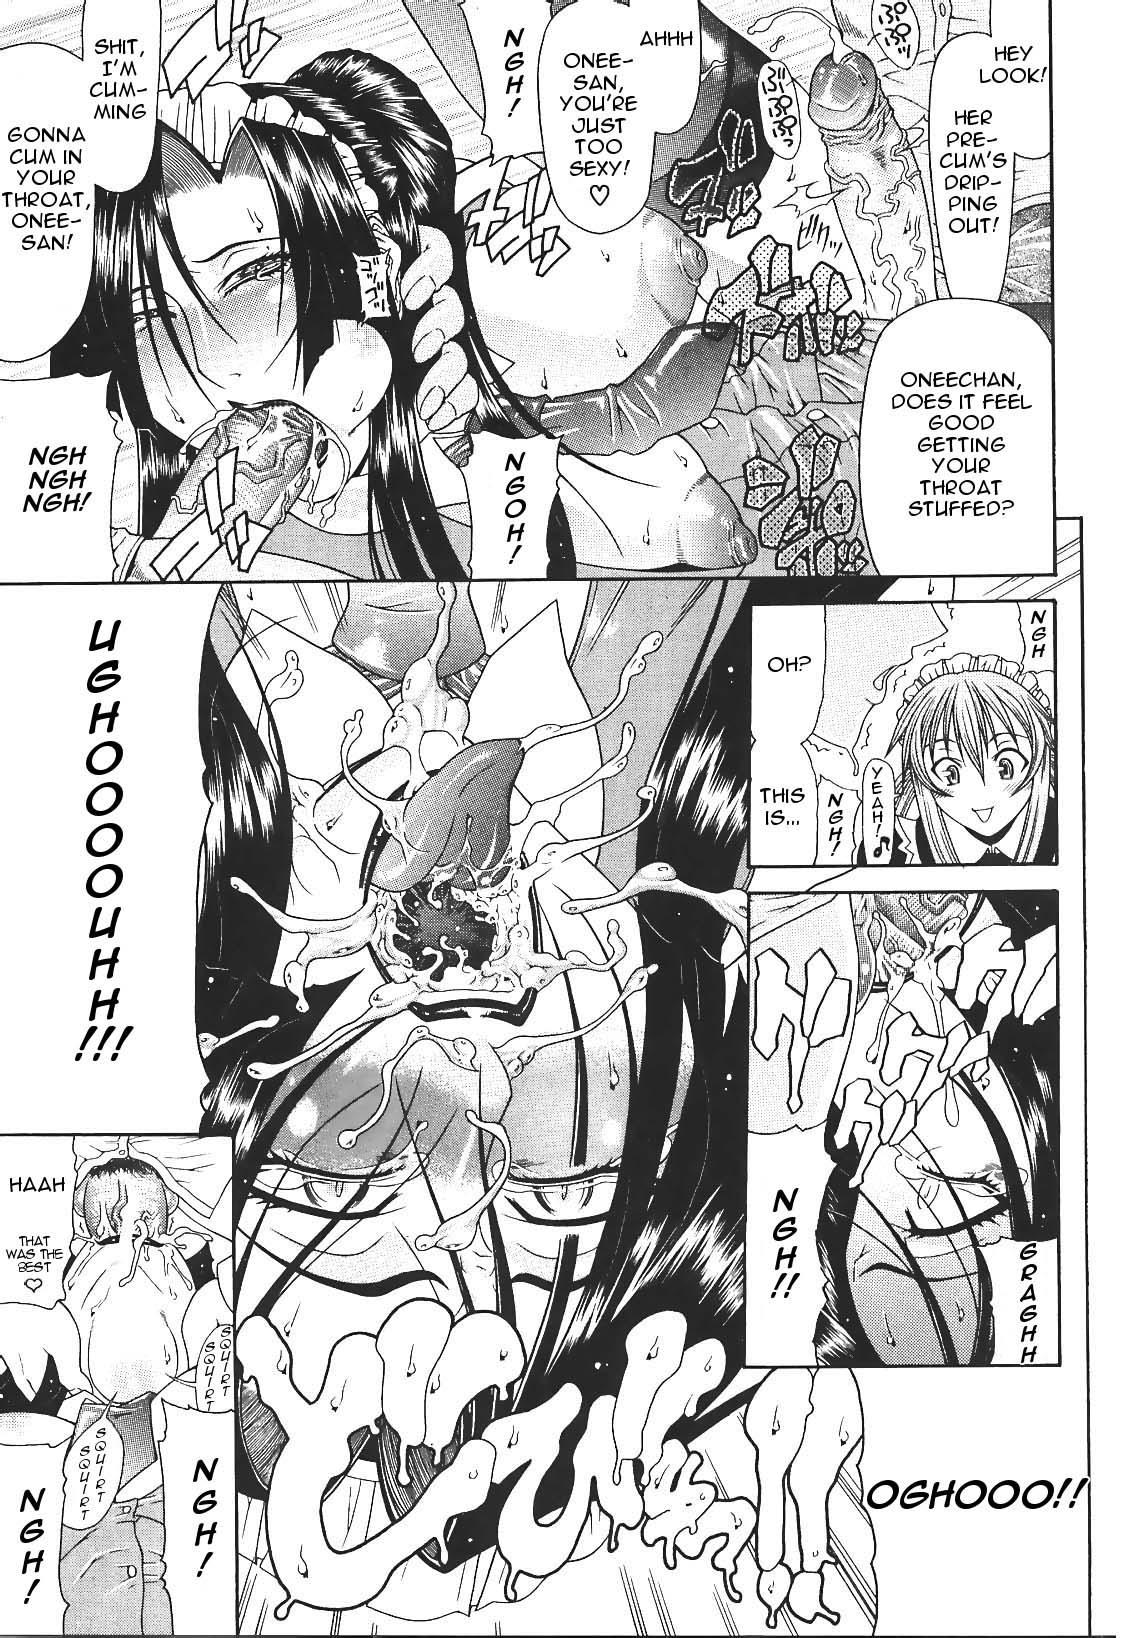 Gura Nyuutou - Escape chapter 7 18